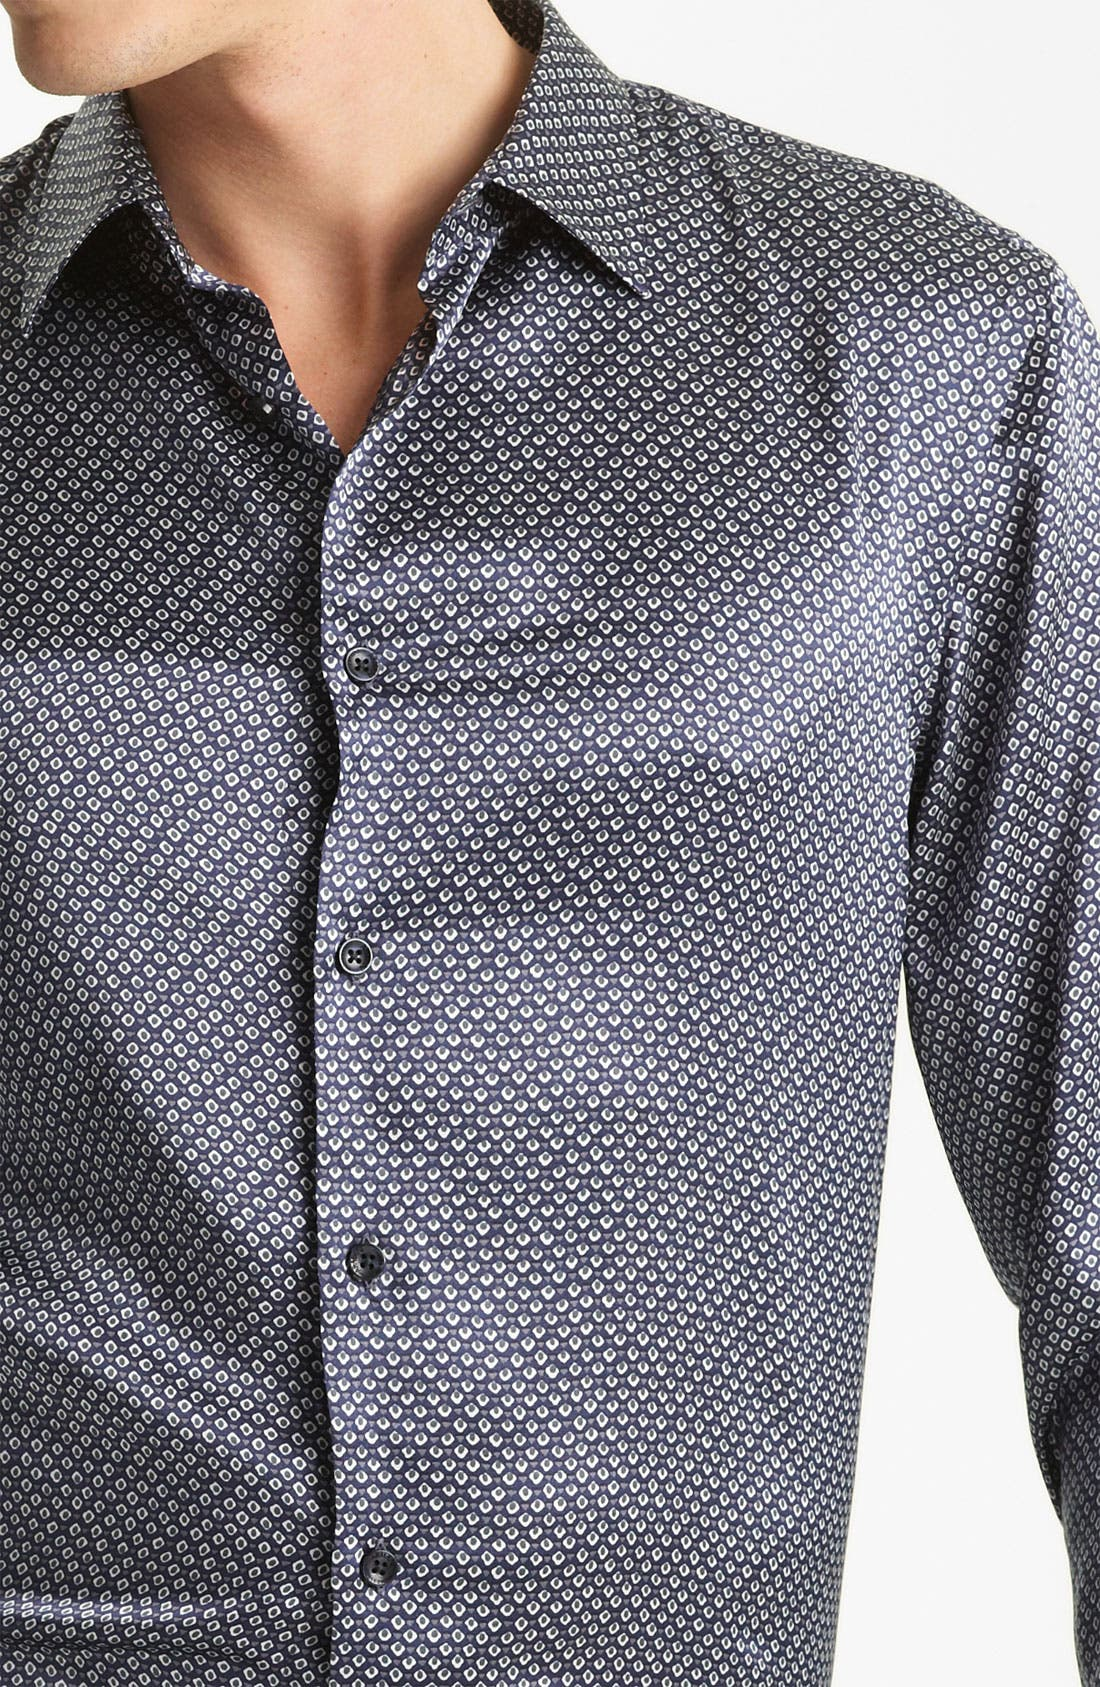 Alternate Image 3  - Armani Collezioni Silk Sport Shirt